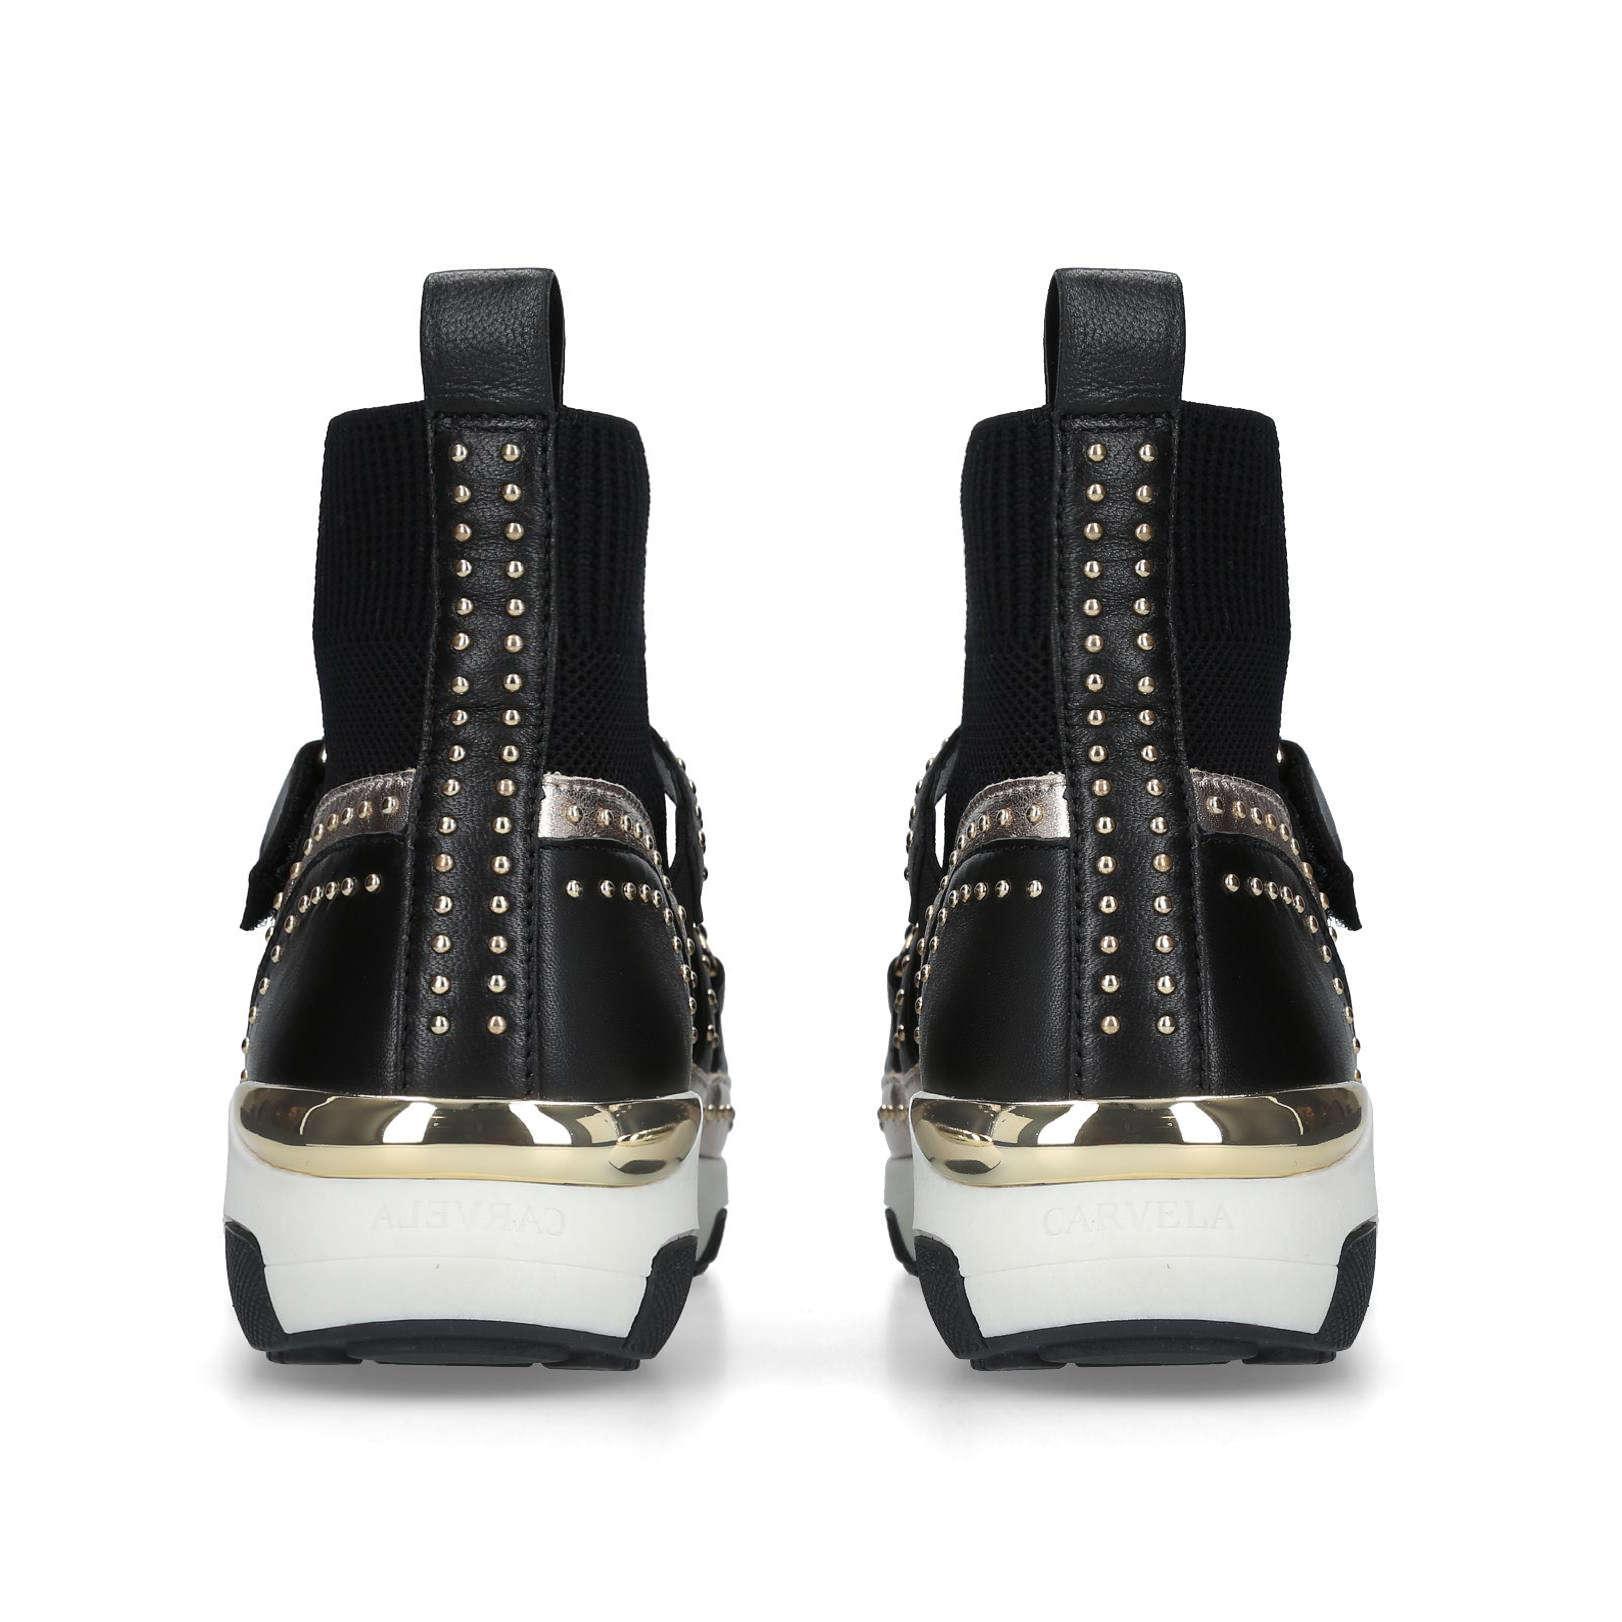 Carvela Kurt Geiger Leather 'listen' High Top Sock Trainers in Black